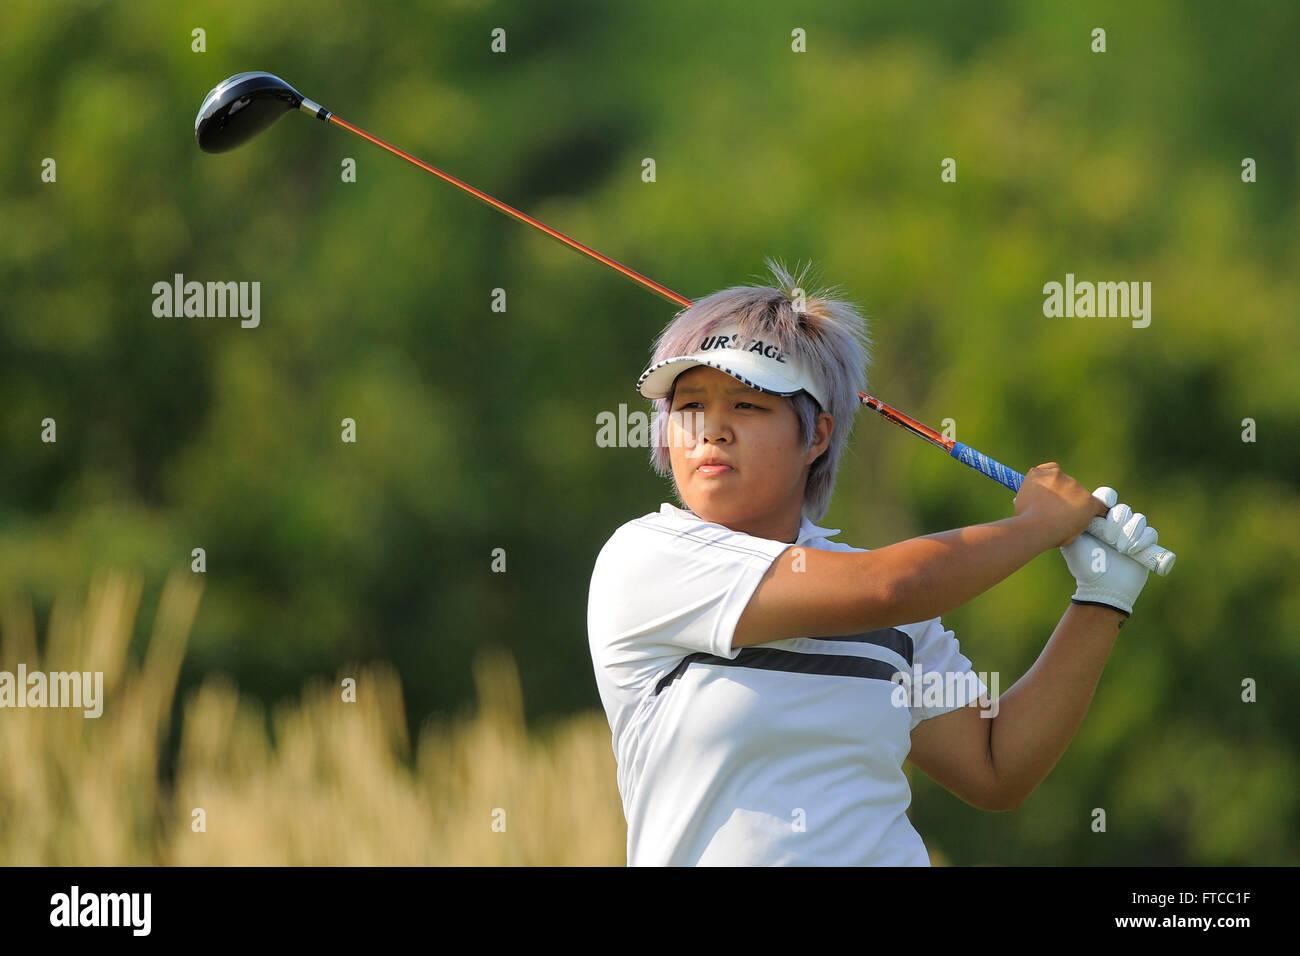 Kohler, Wis, USA. 5th July, 2012. Naru Nomura during the first round ...